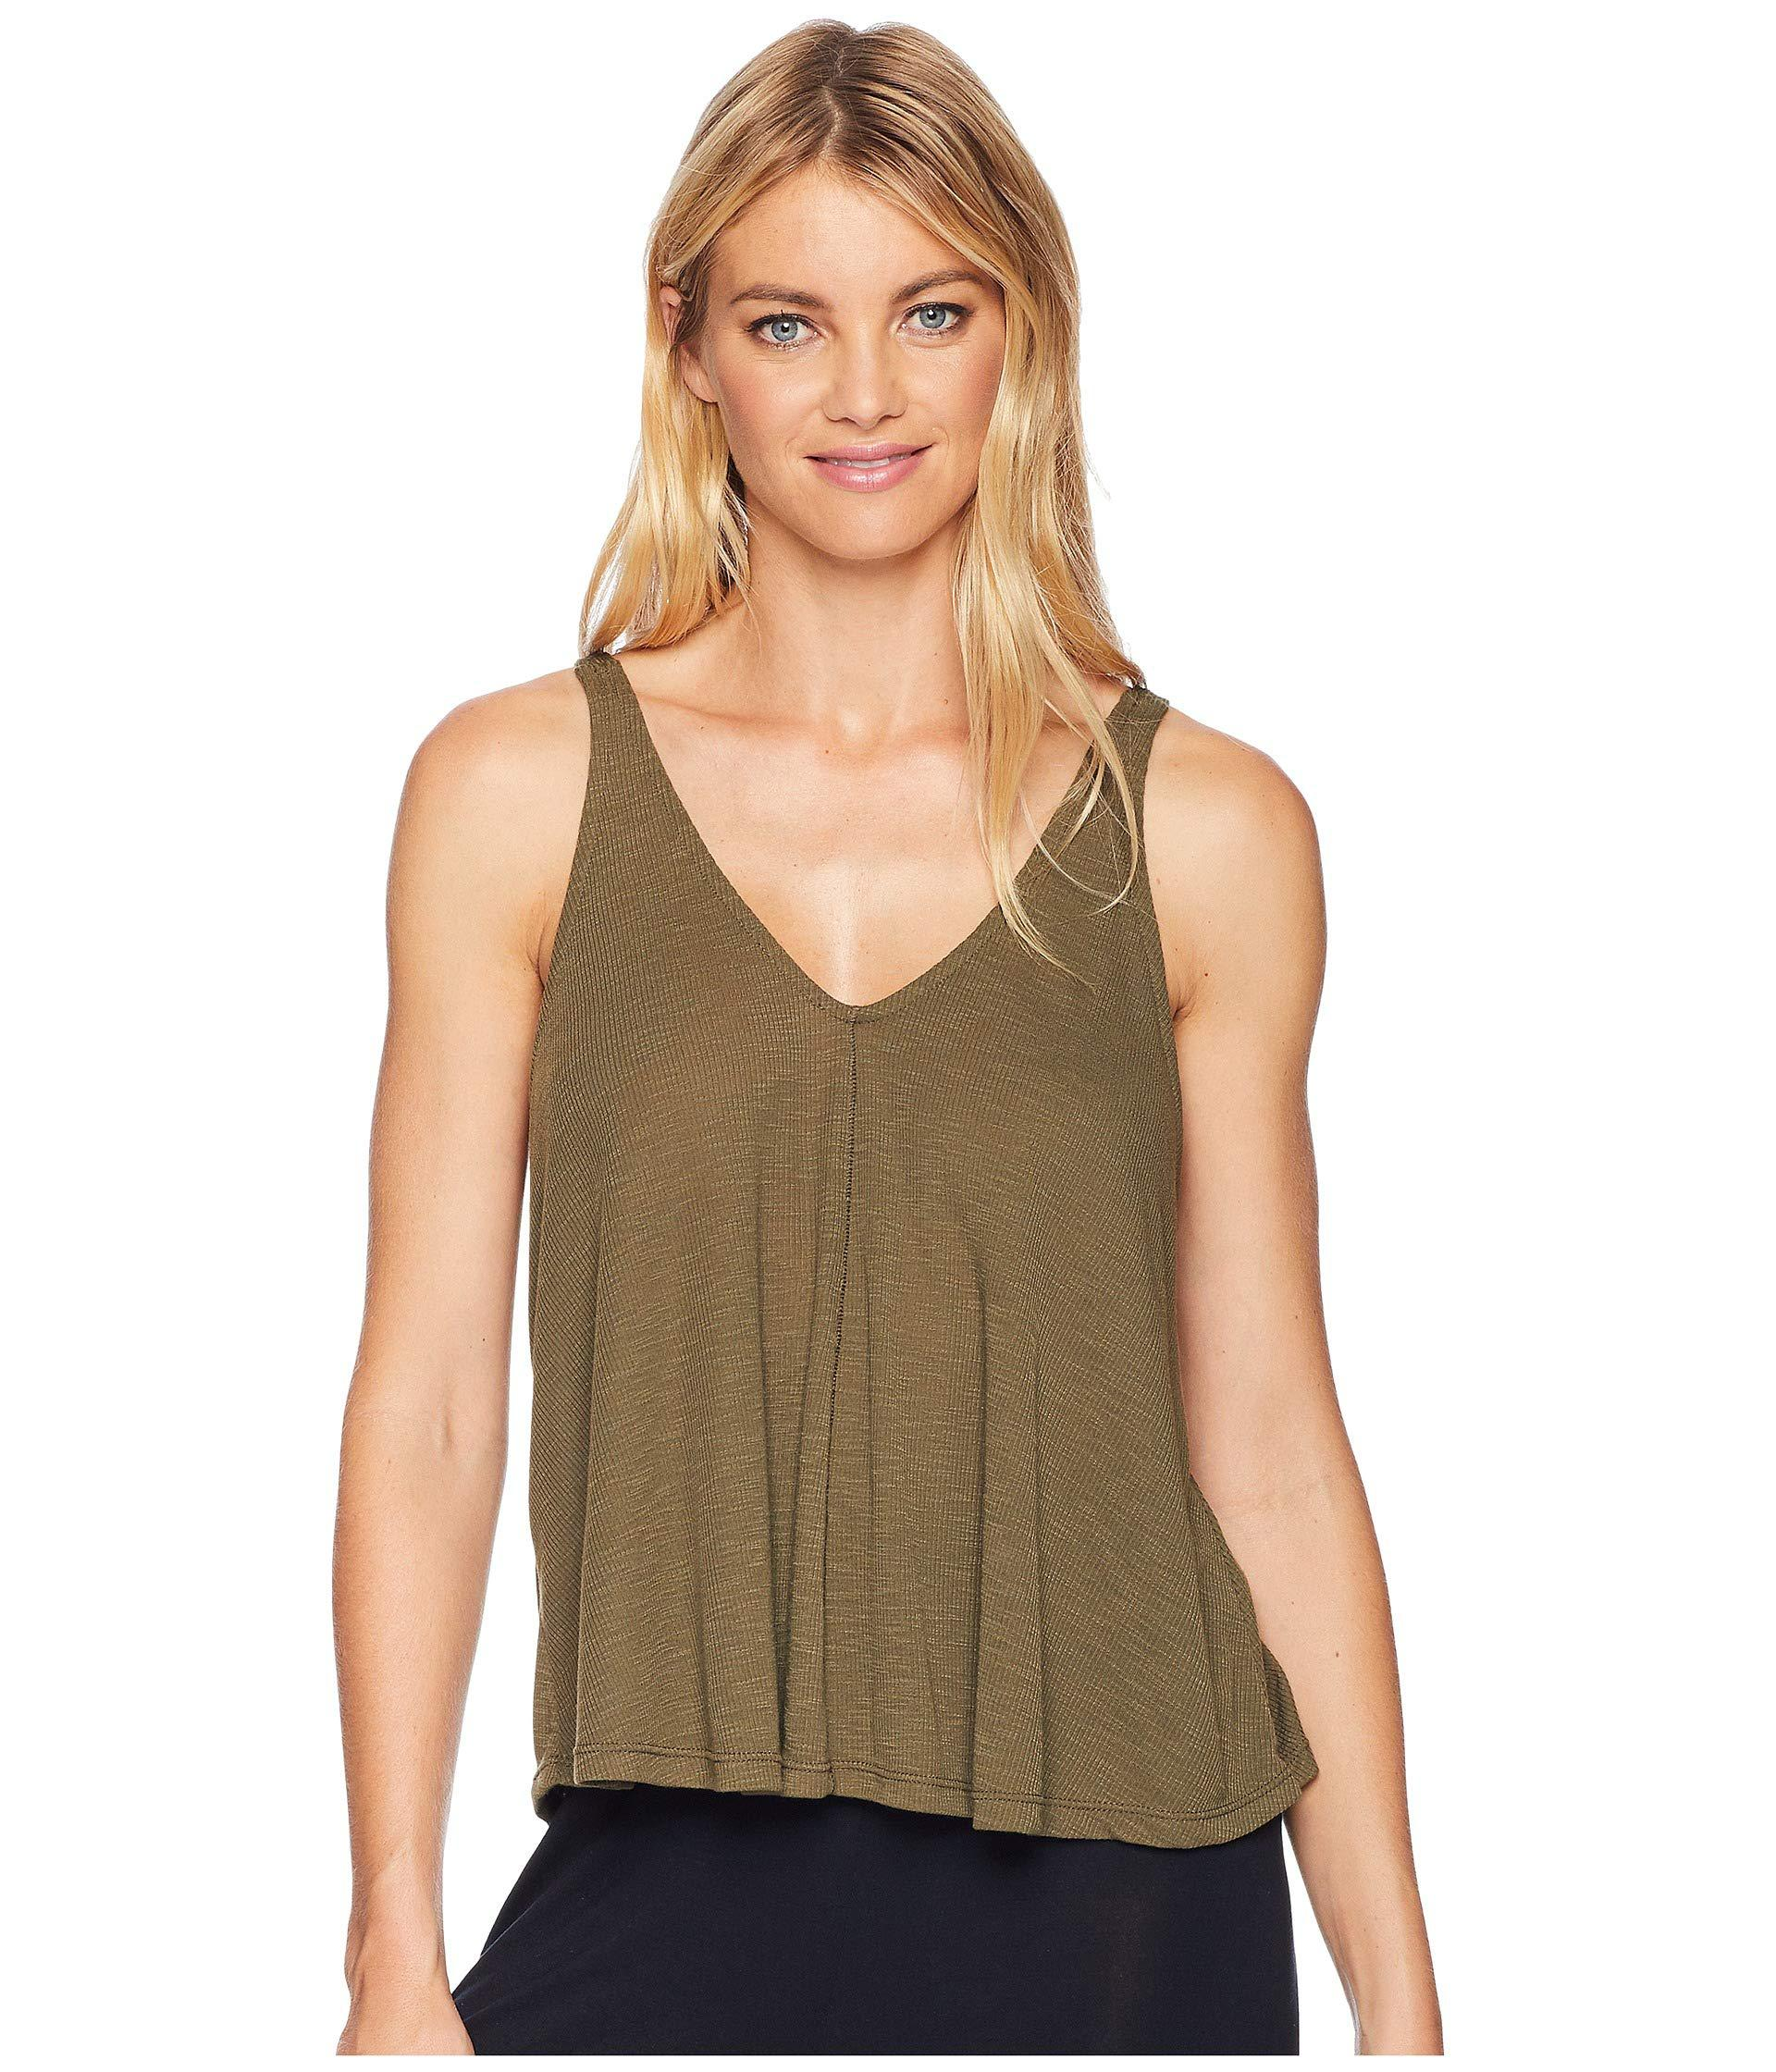 c2ee8510650a1c Lyst - Free People Dani Tank Top (army) Women s Sleeveless in Green